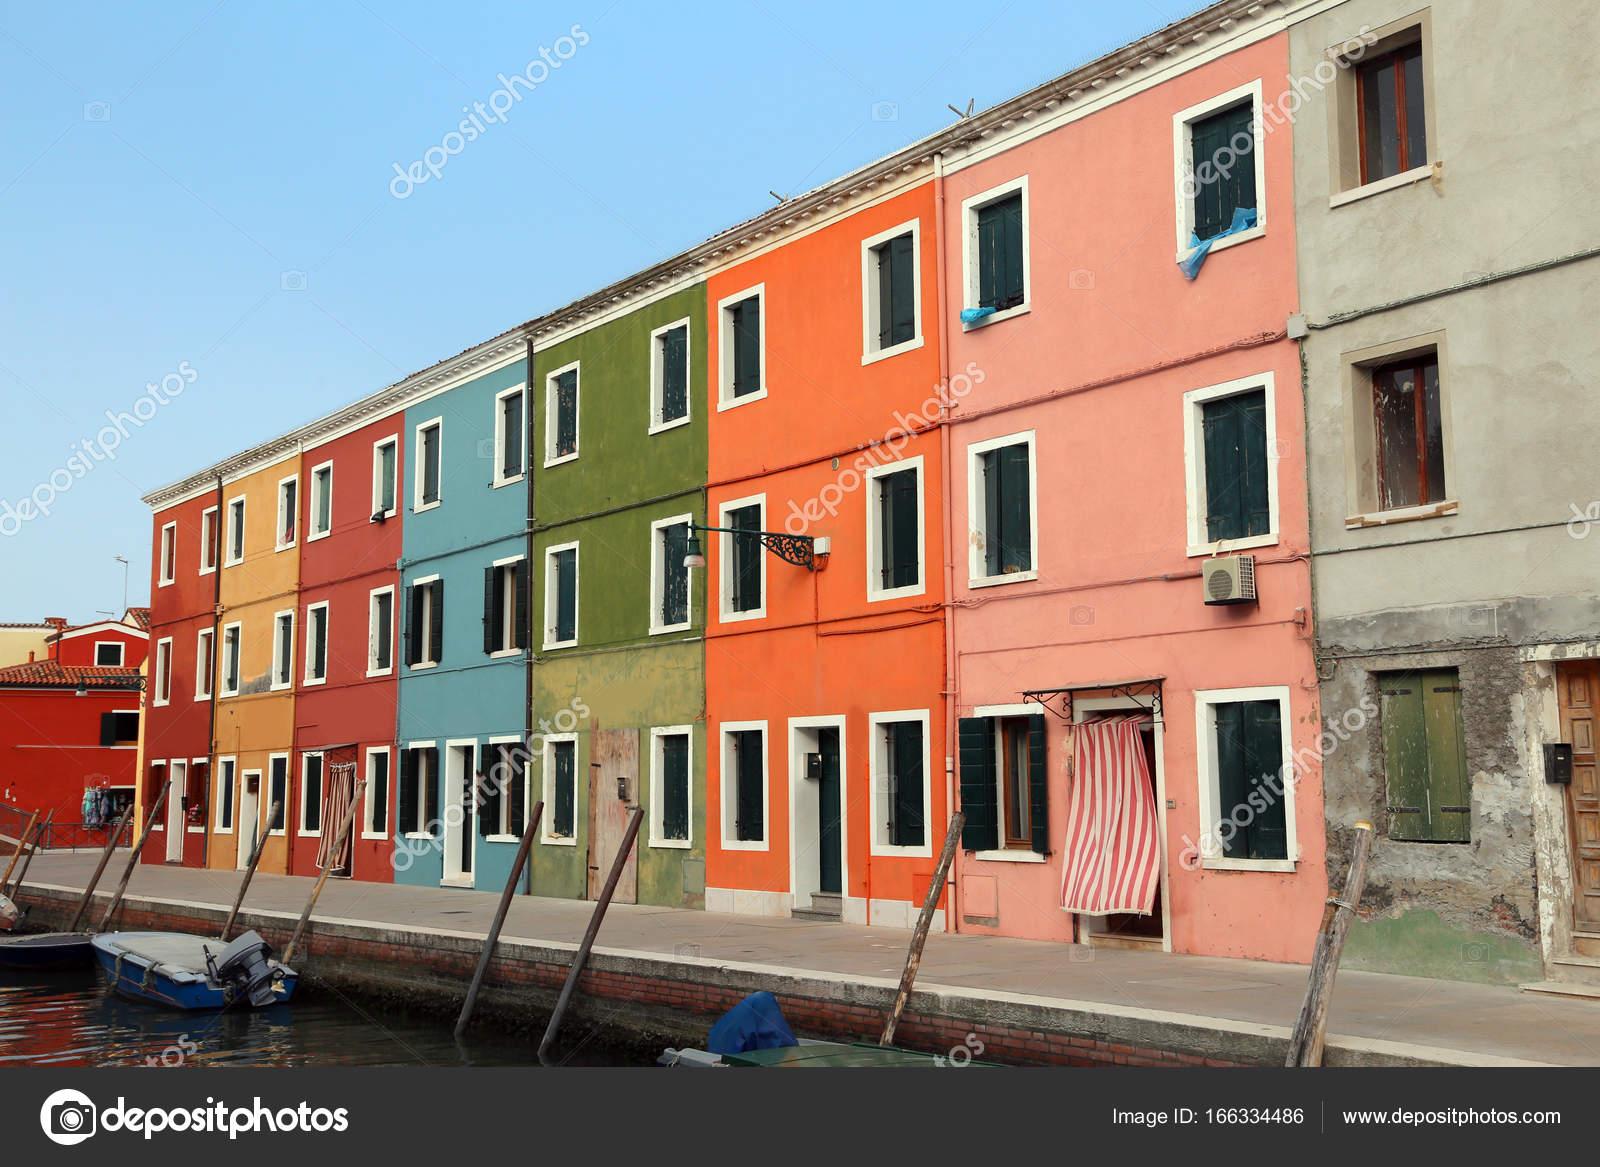 Anschauliche farbige h user auf der insel burano in for Case roma nord